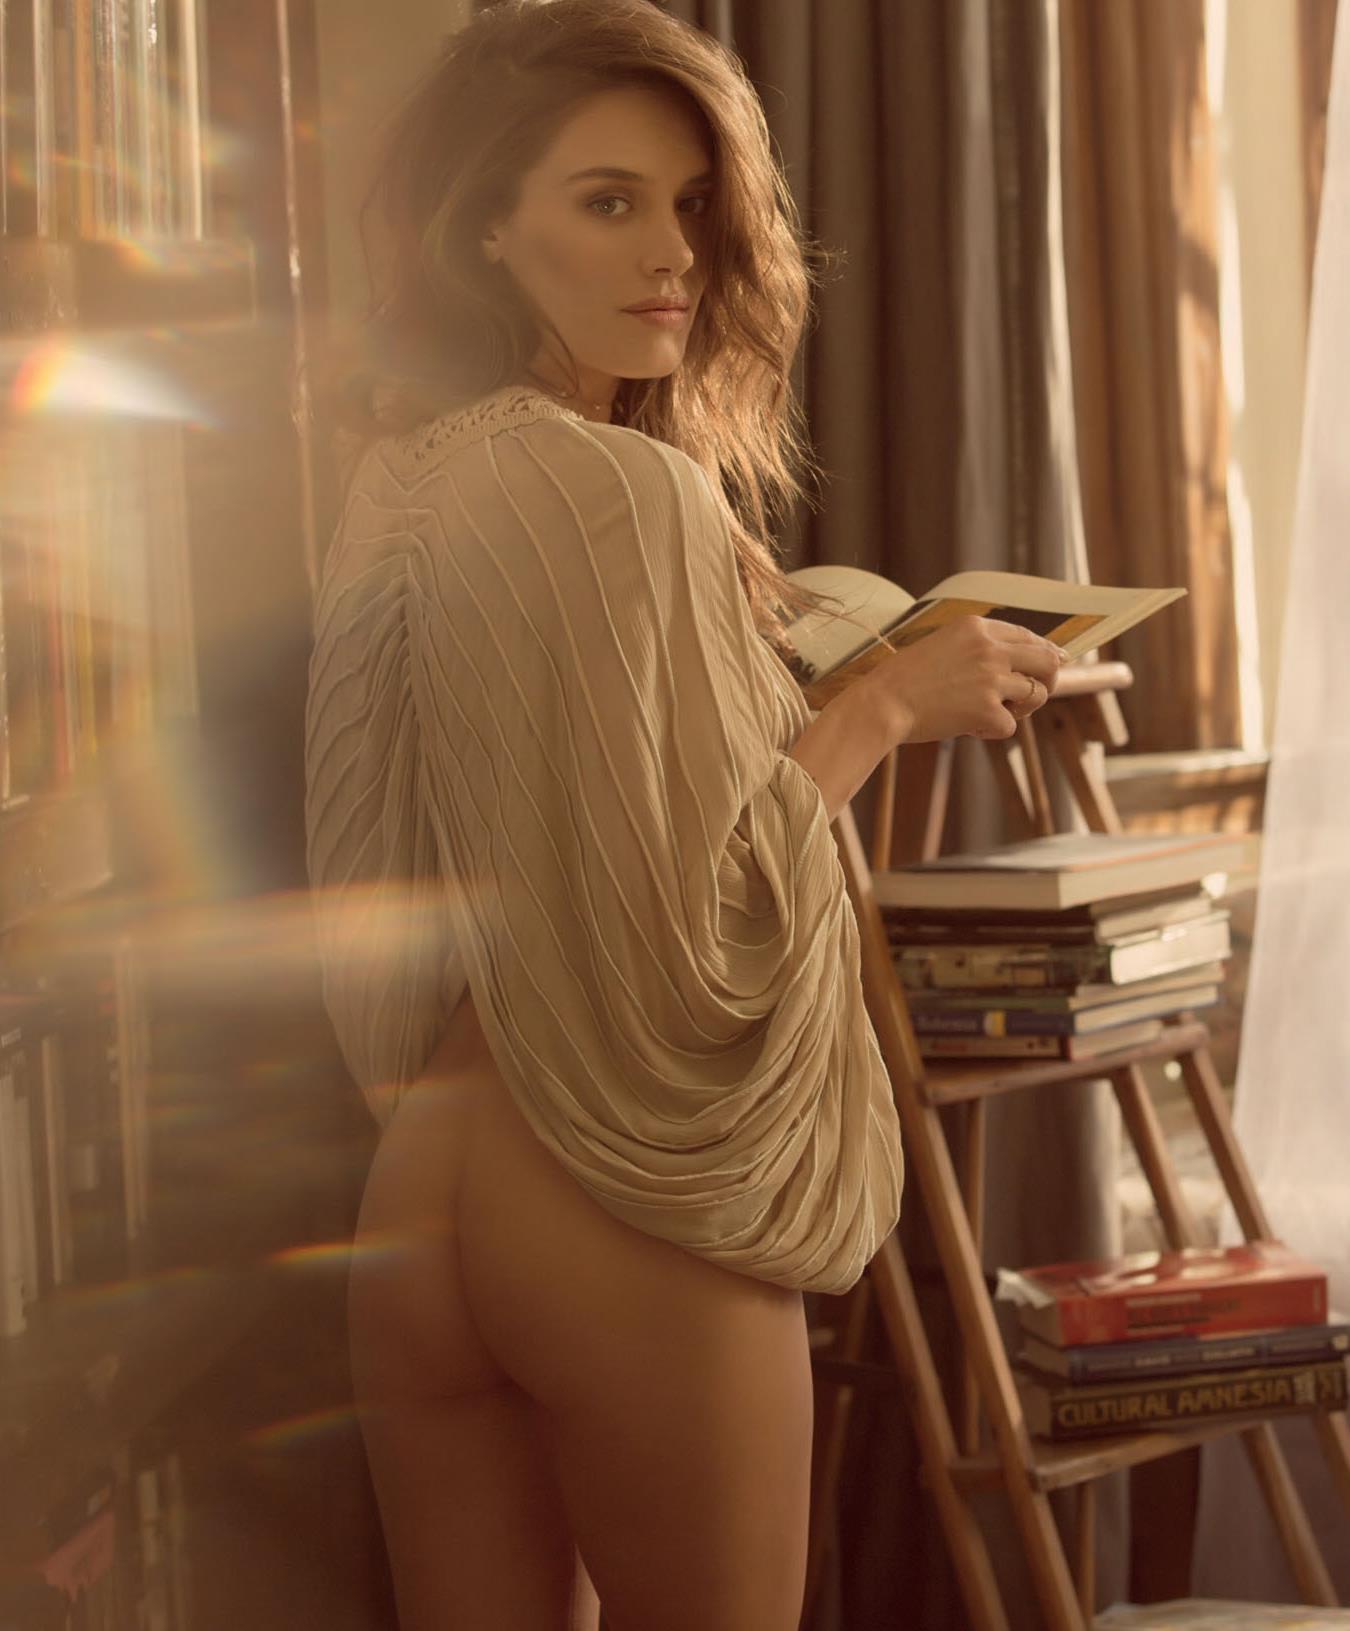 nudes (29 photos), Selfie Celebrity pic